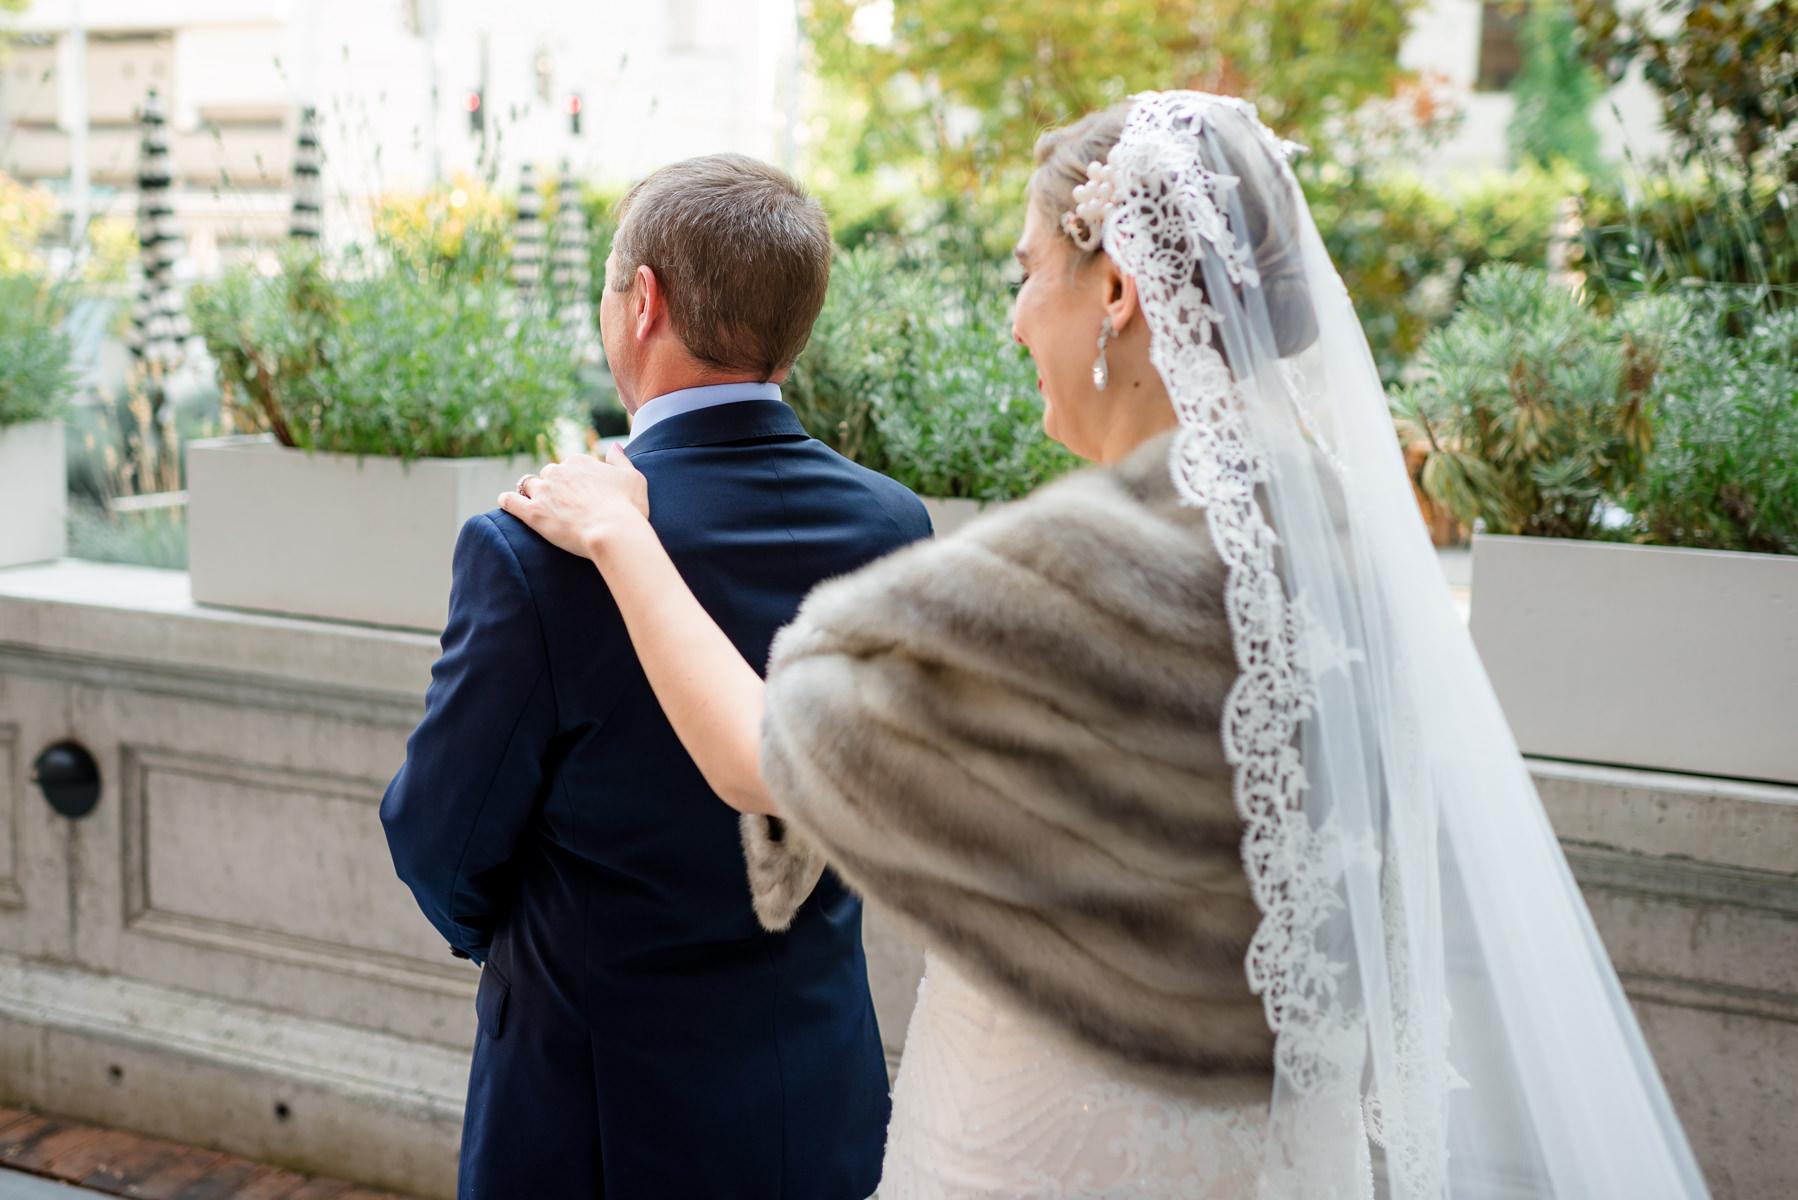 Andrew Tat - Documentary Wedding Photography - Hotel Sorrento - Seattle, Washington -Jessica & Paul - 05.jpg